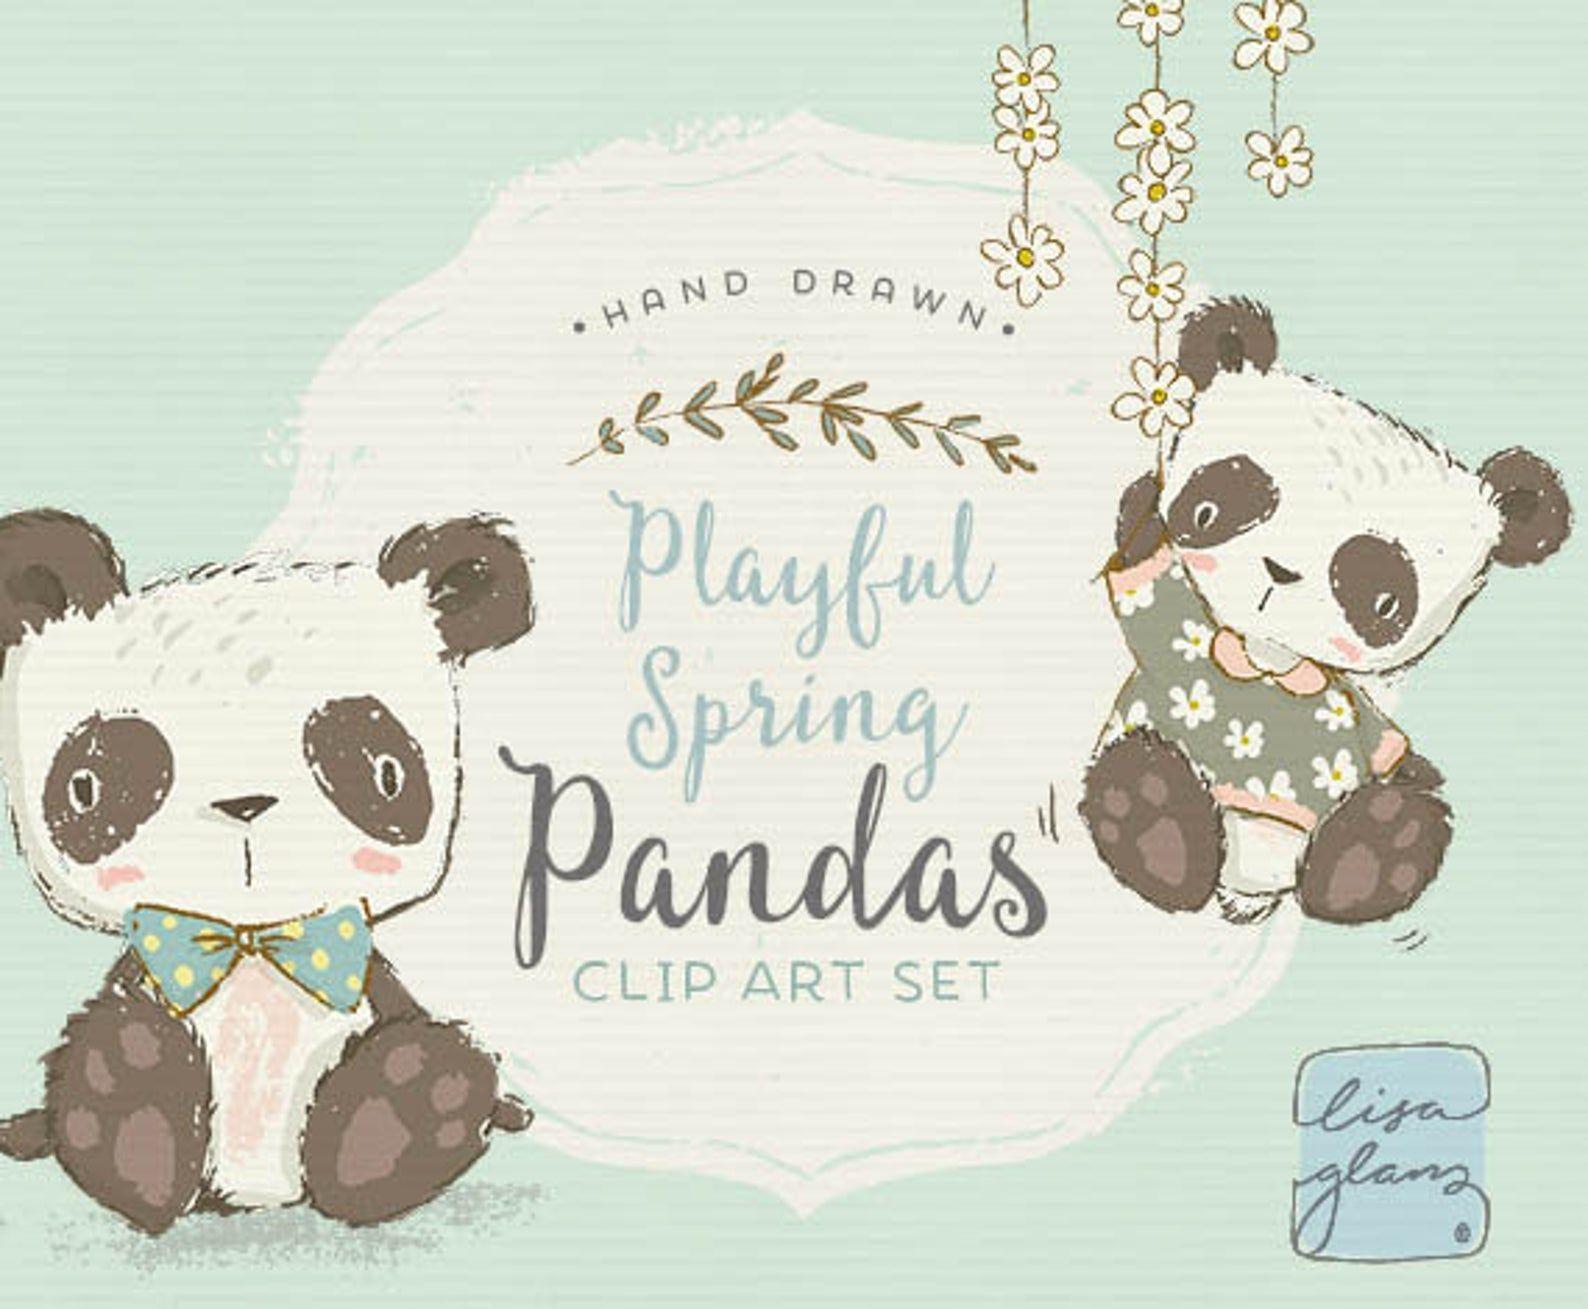 Spring Pandas Clipart Set Panda Bear Clip Art Sweet Clipart Etsy In 2021 Clip Art Panda Illustration Animal Clipart